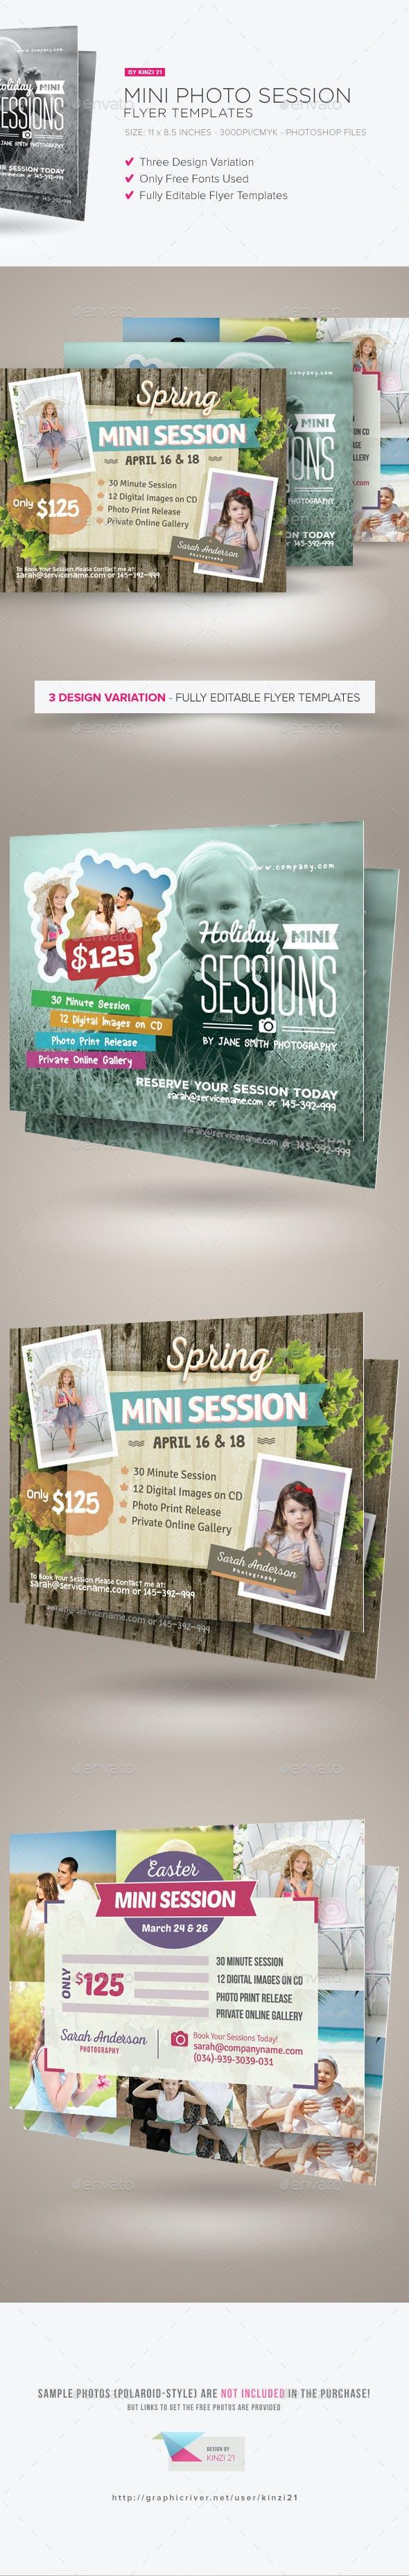 mini photo session flyer templates by kinzi21 graphicriver